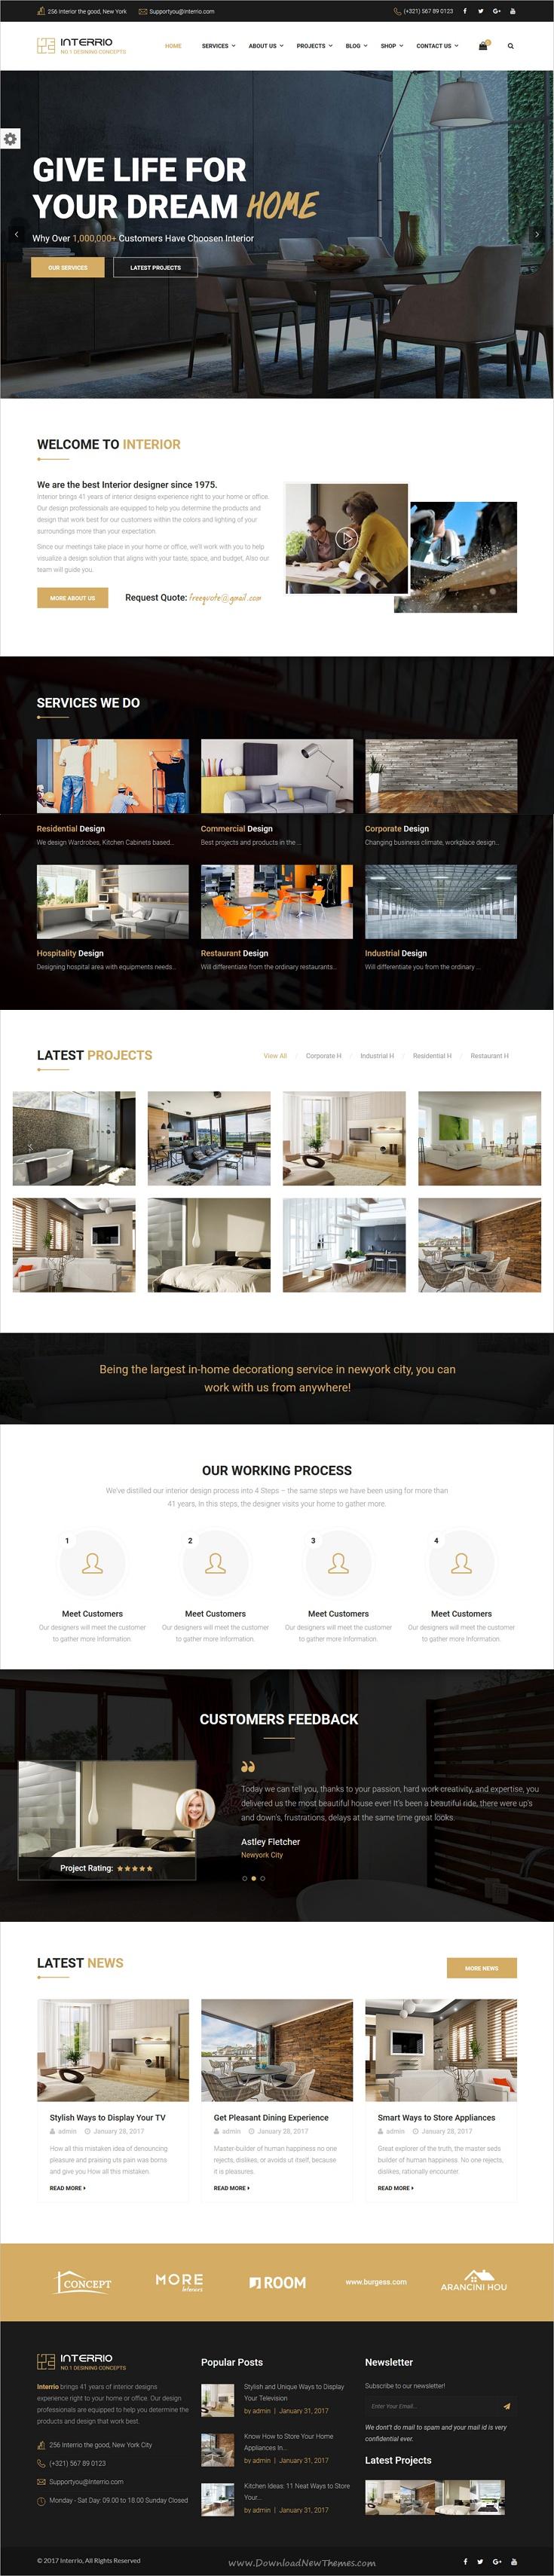 Interrio – WordPress Theme for Architecture, Construction and ...